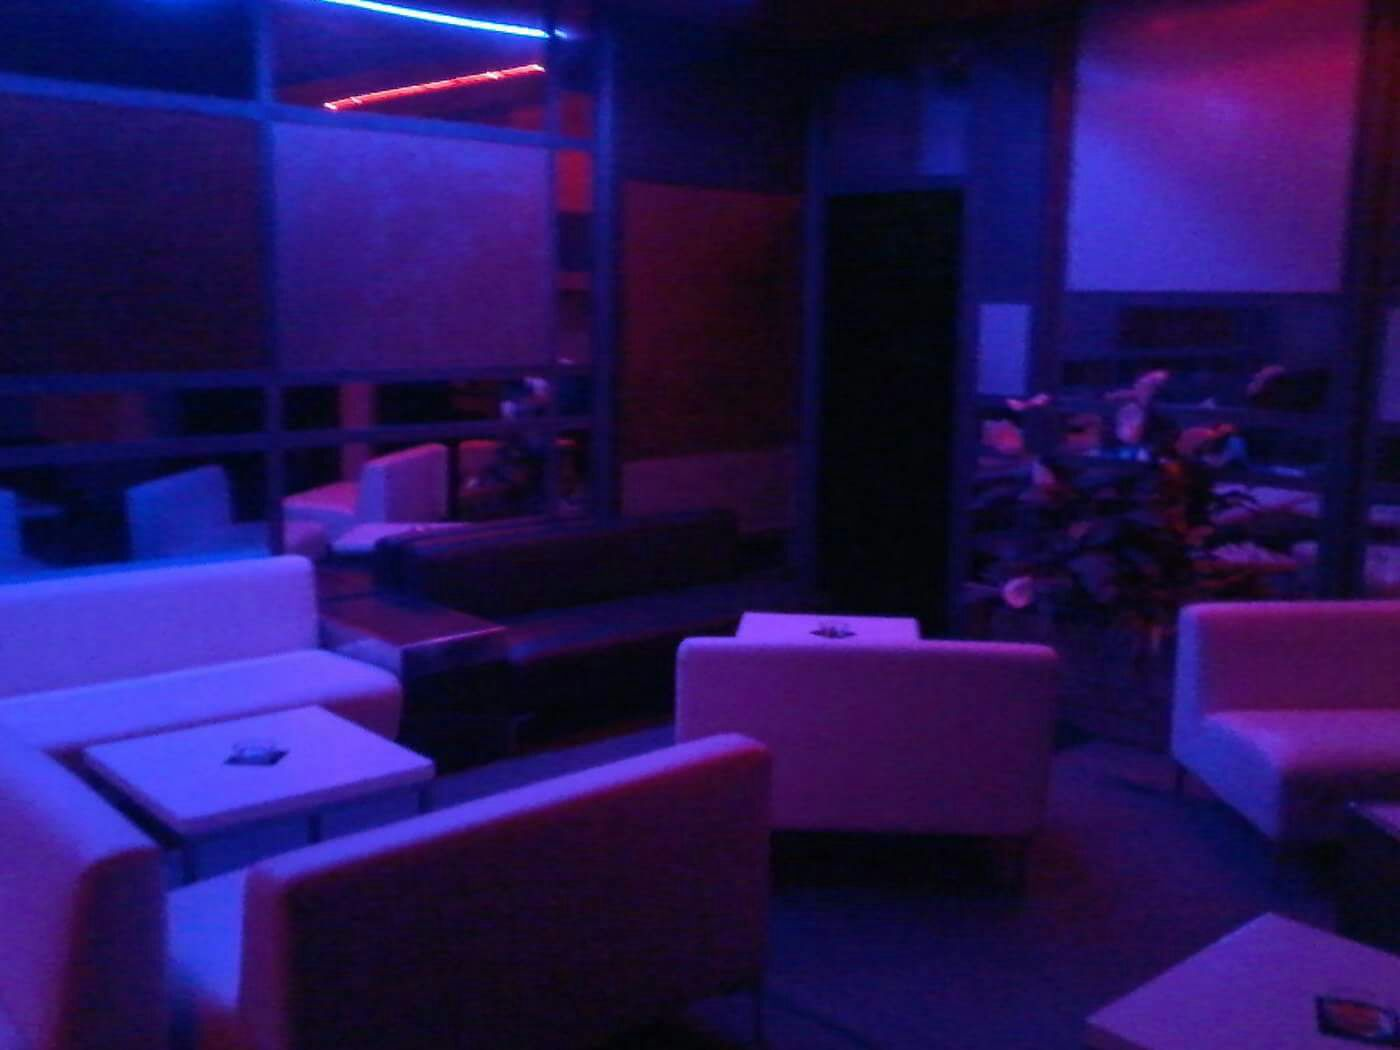 moulin rouge niht club desenzano